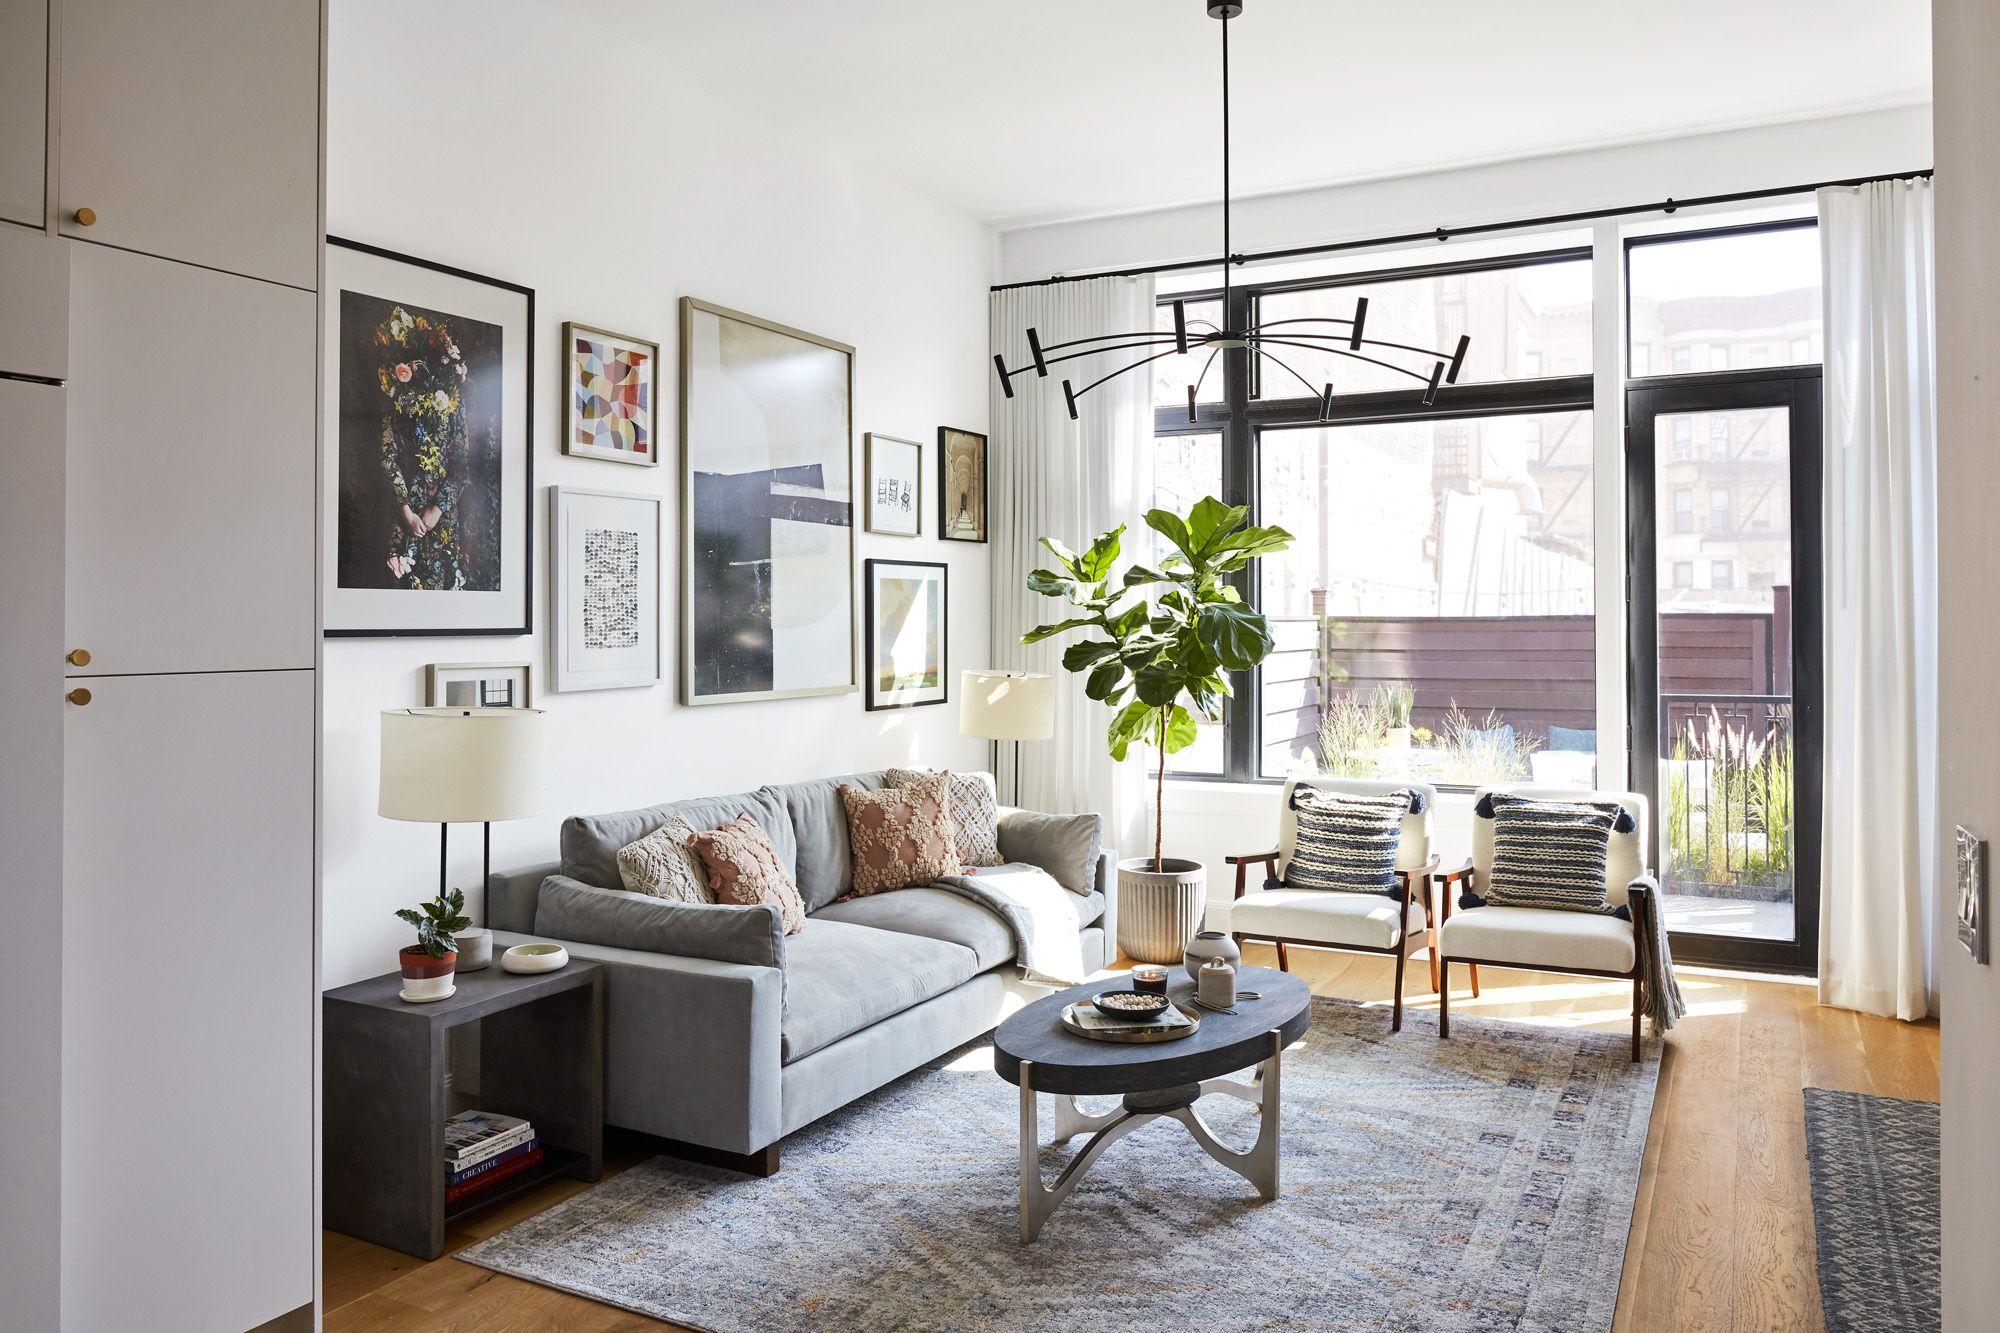 In The 2019 Real Simple Home Designer Anita Yokota Infused Her